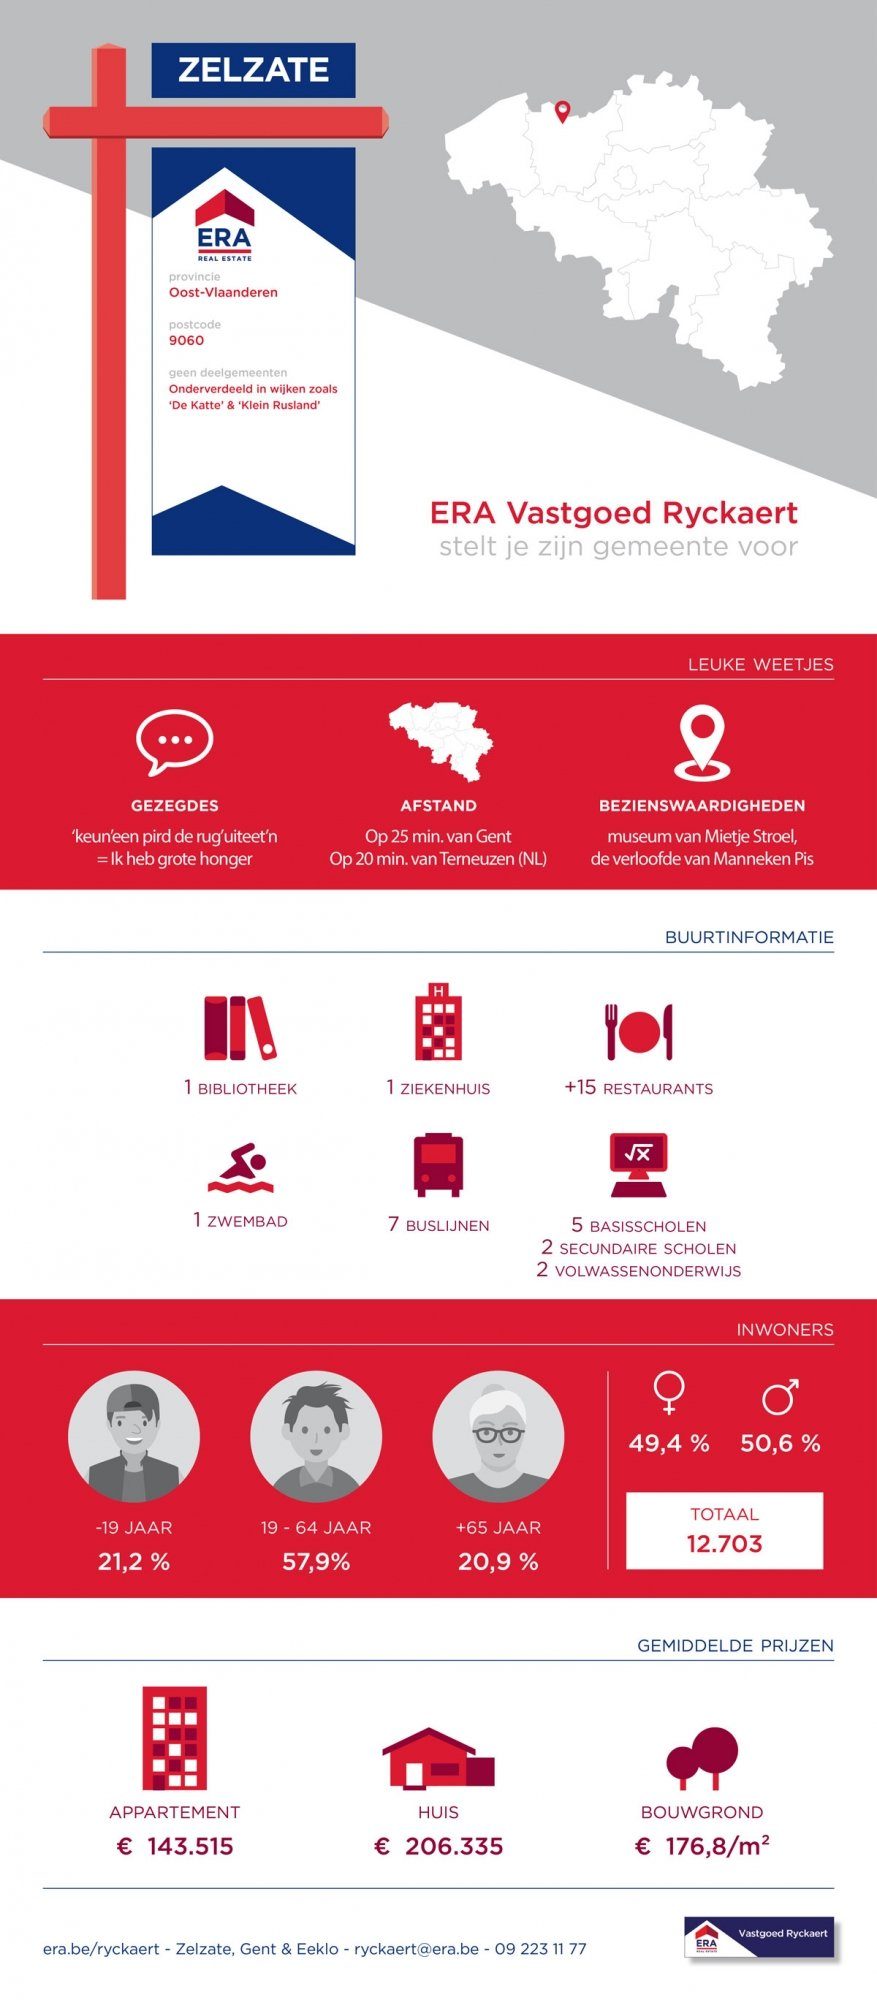 Infographic Wonen in Zelzate - ERA Vastgoed Ryckaert